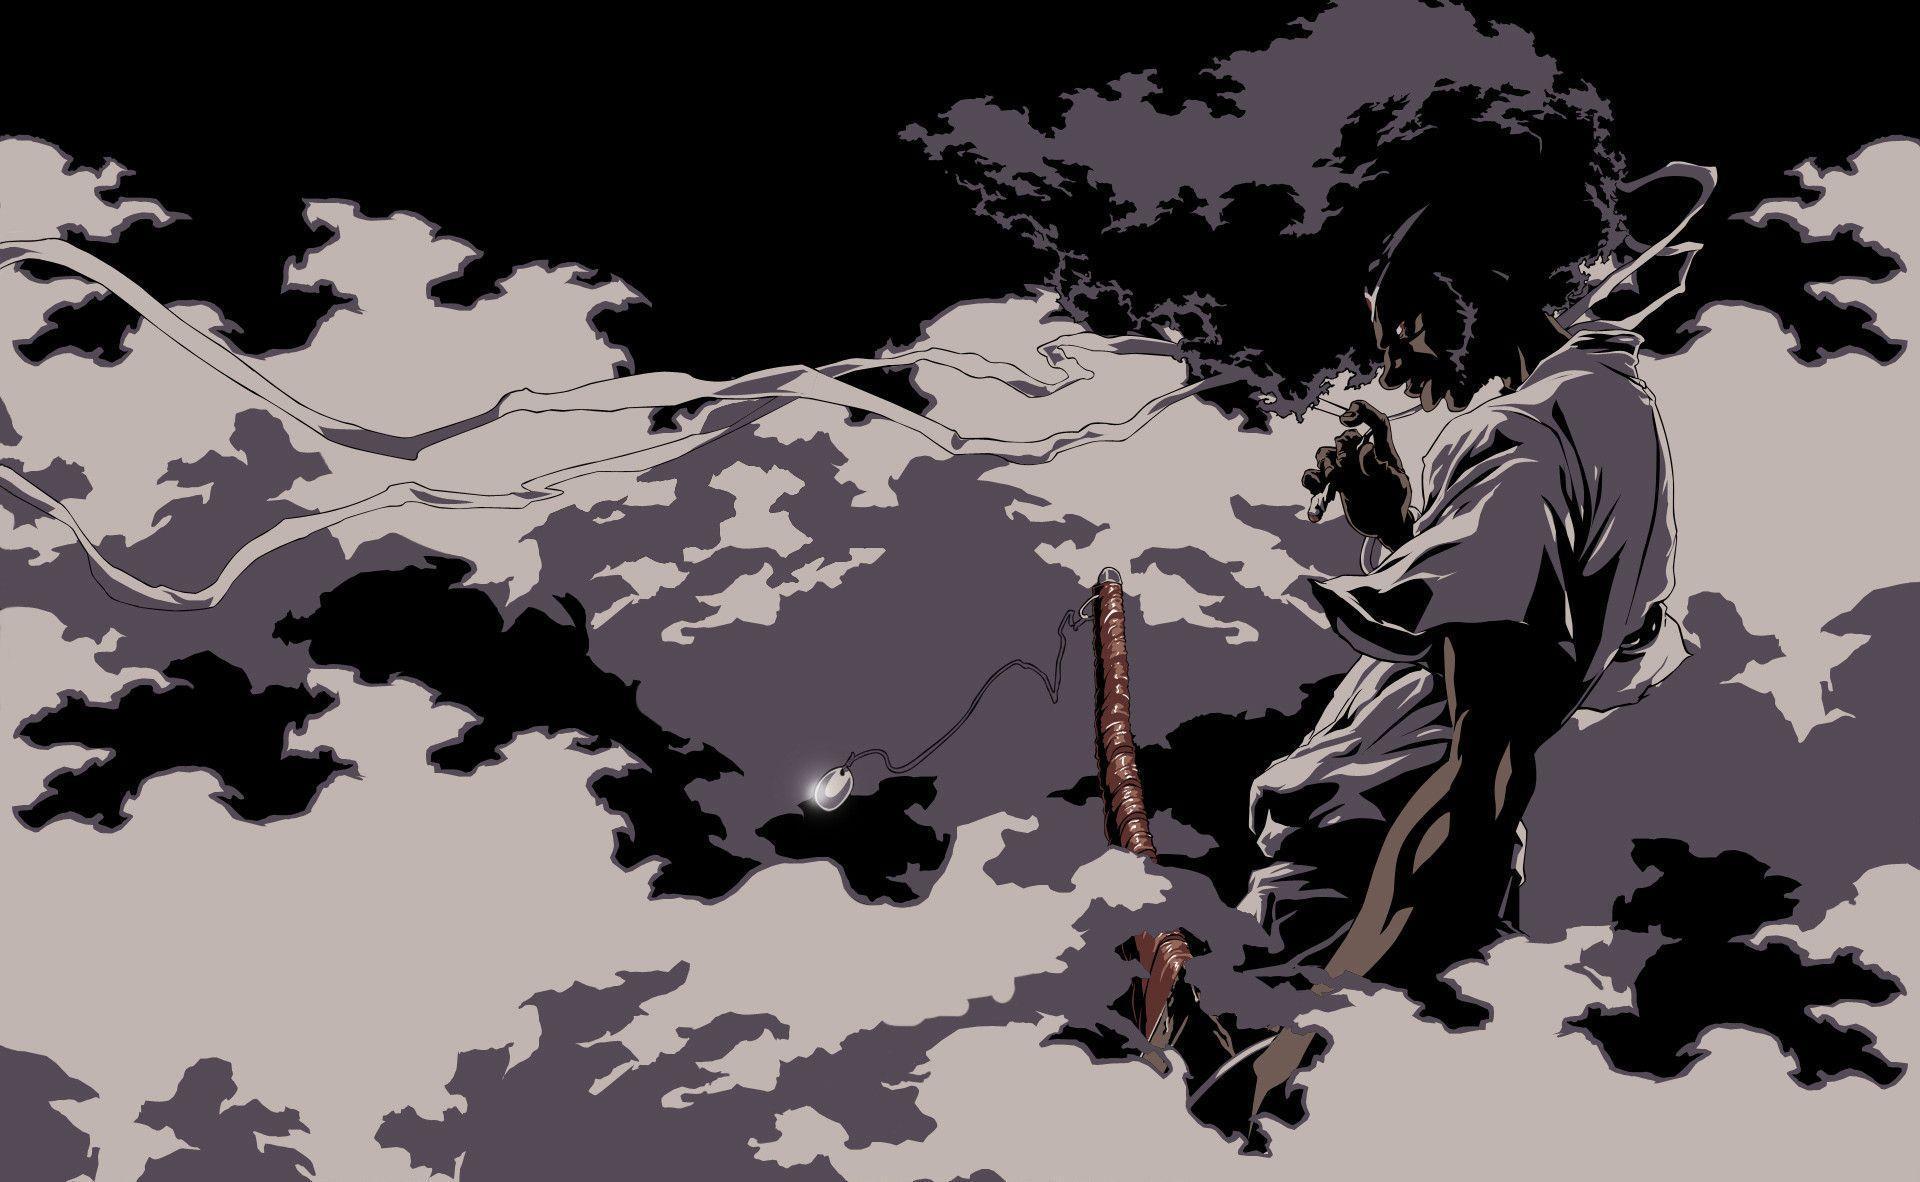 30 samurai wallpapers hd - photo #27